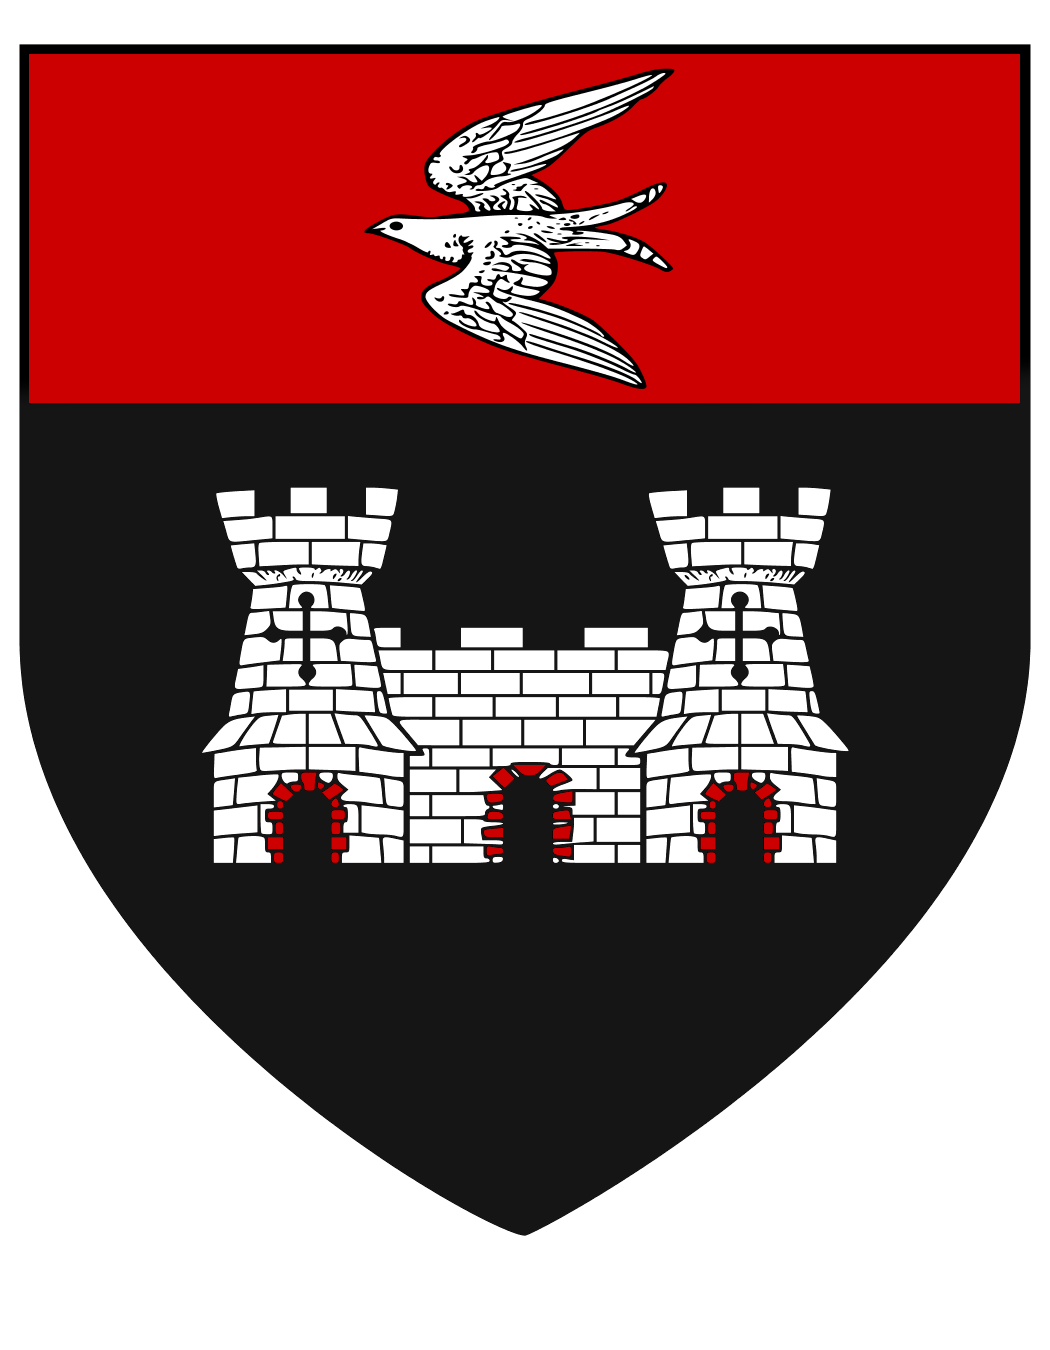 coat_of_arms_Mechthilde_von_Wertburg.png